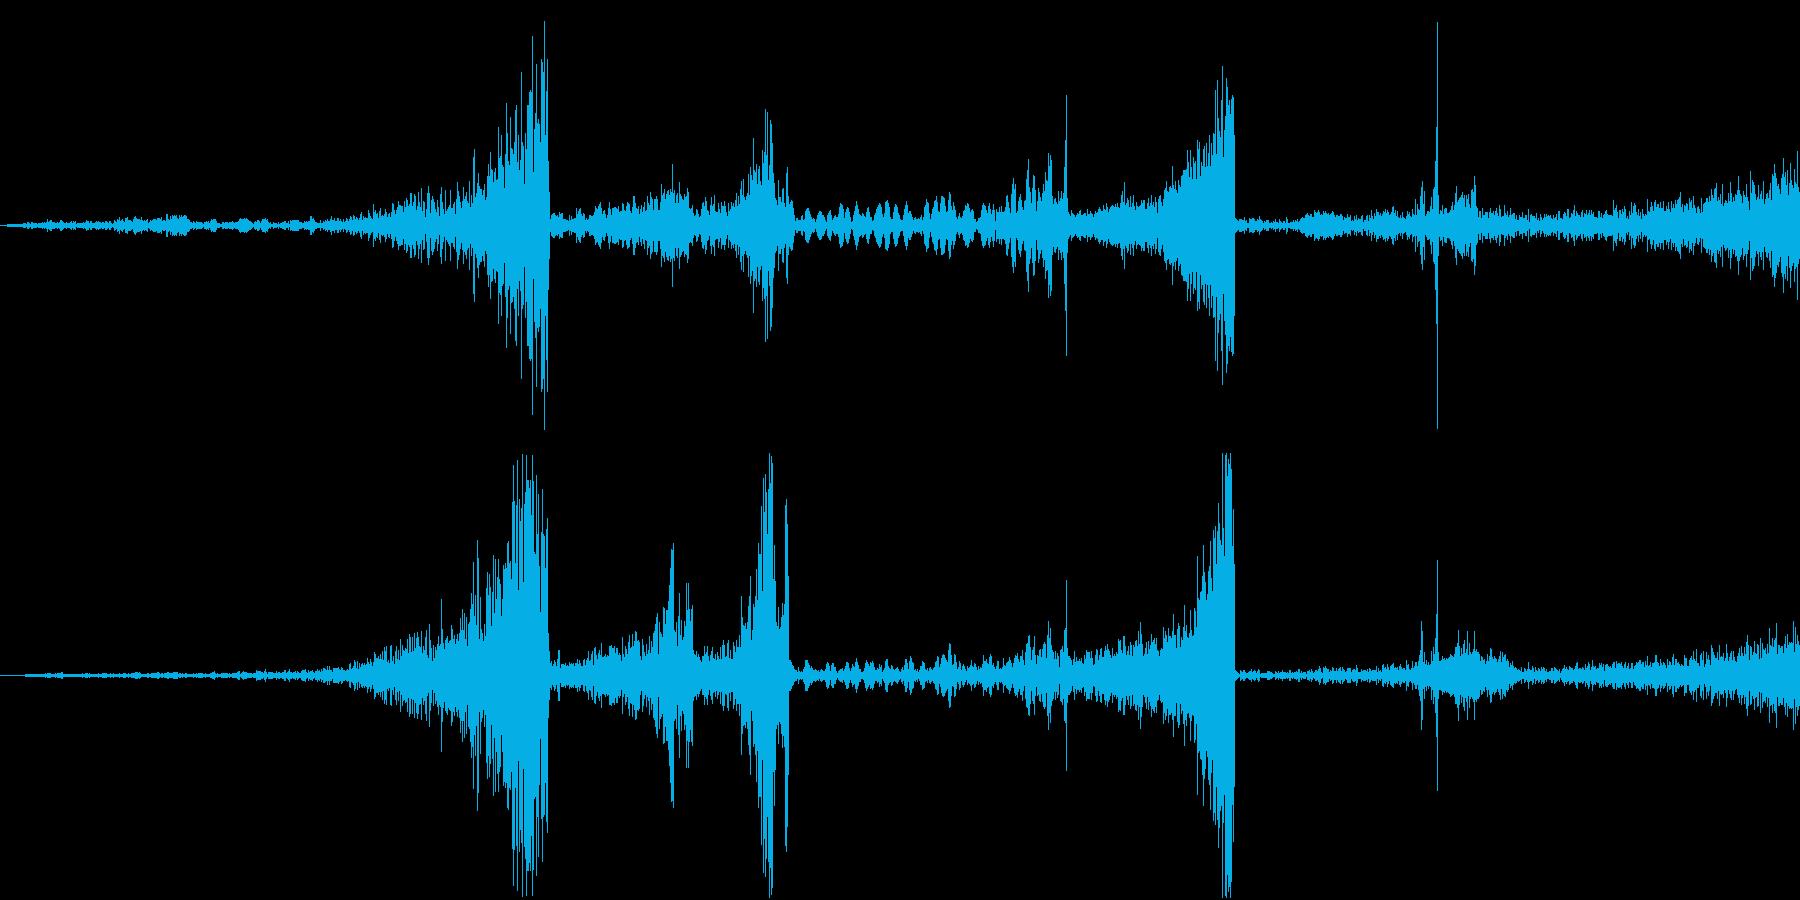 Zap 巻き戻し音・ザップ効果音 6の再生済みの波形